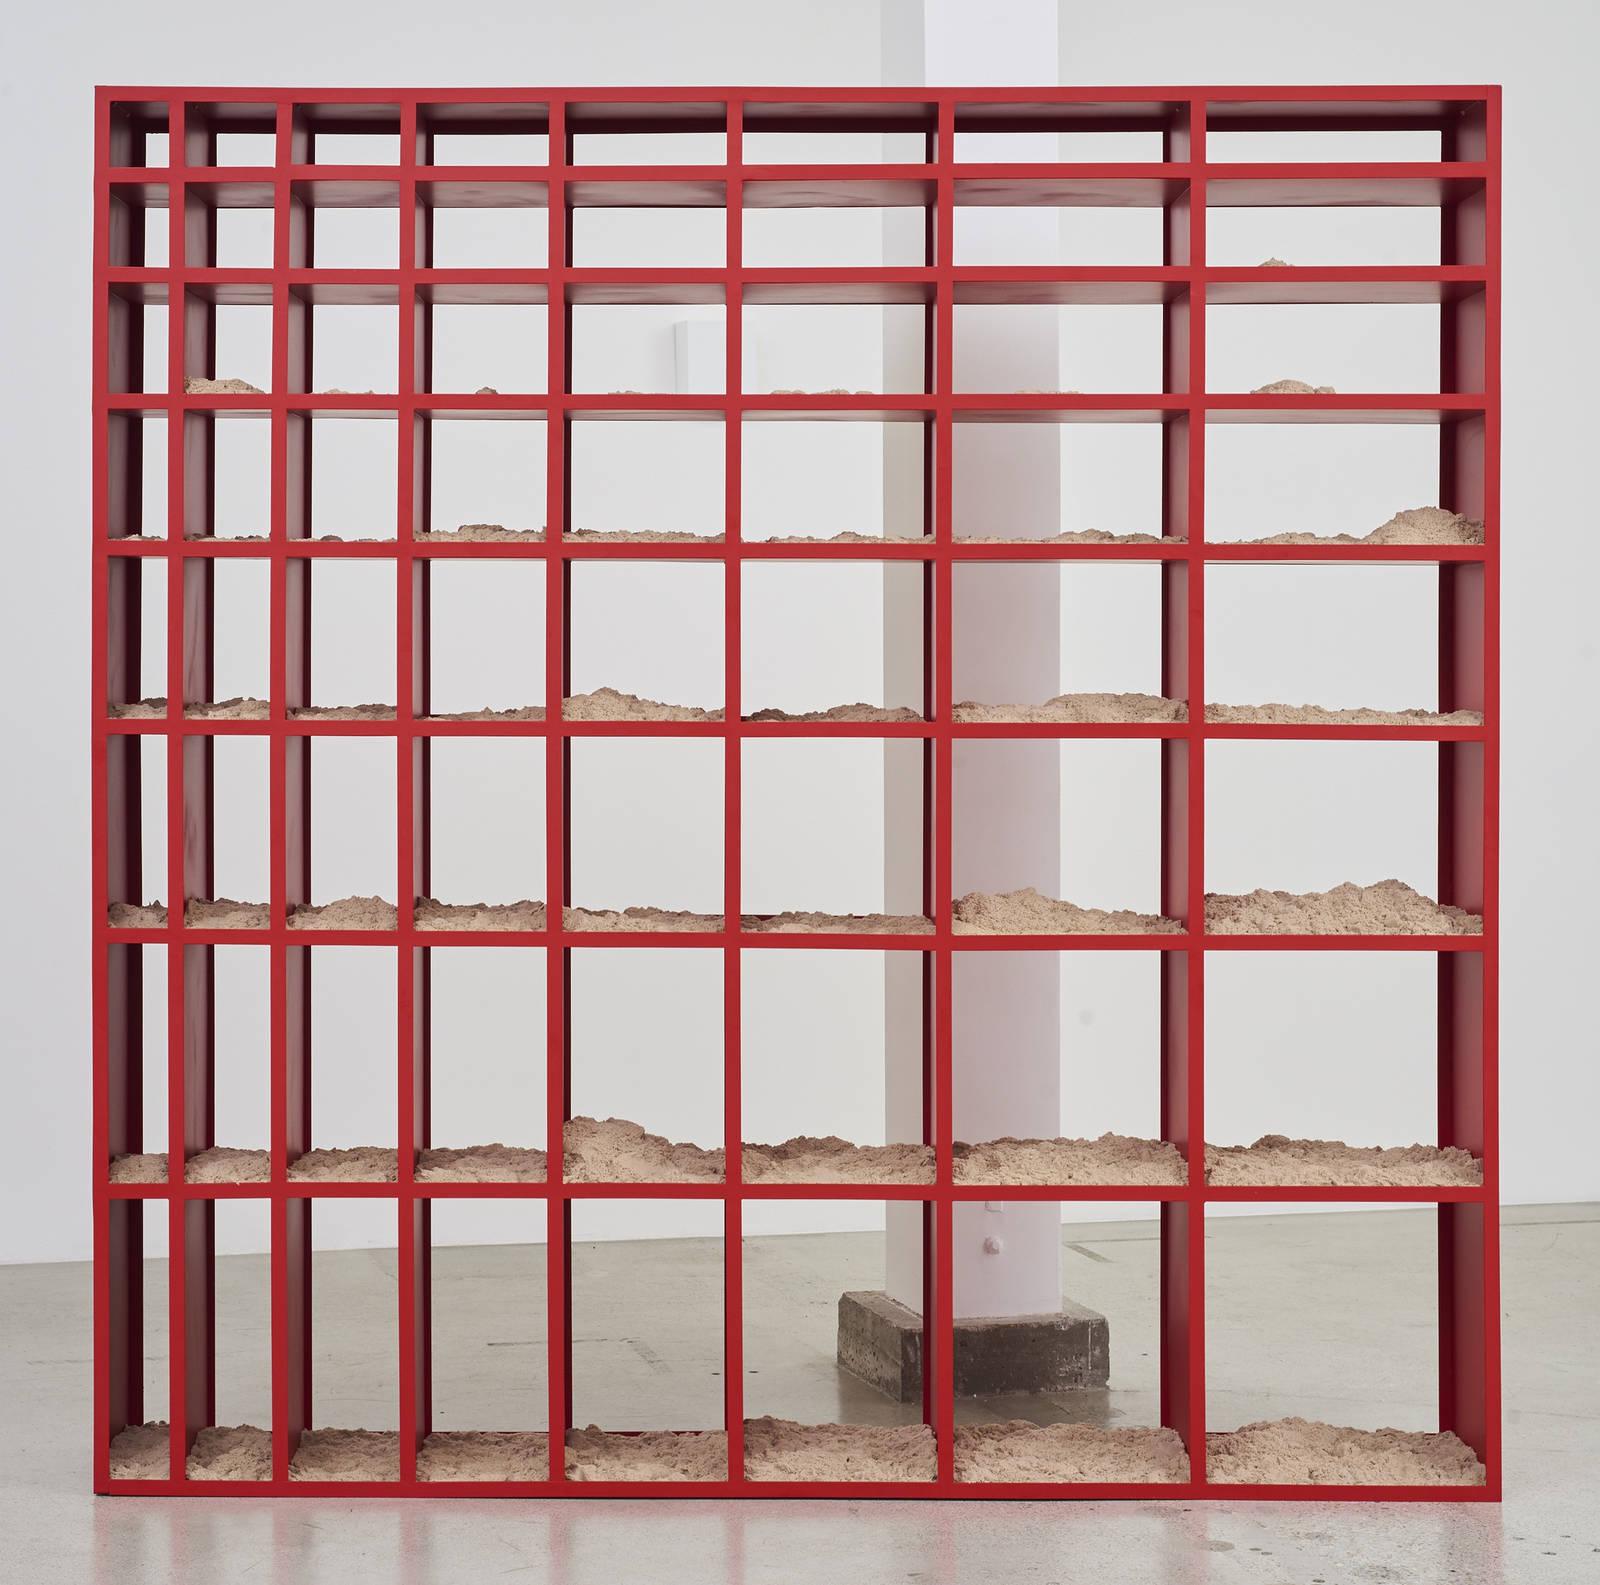 Wermers_Sand Shelf #1, 2016-2017_Powdercoated steel, kinetic sand_91 7_16 x 91 7_16 x 16_NW00036ST